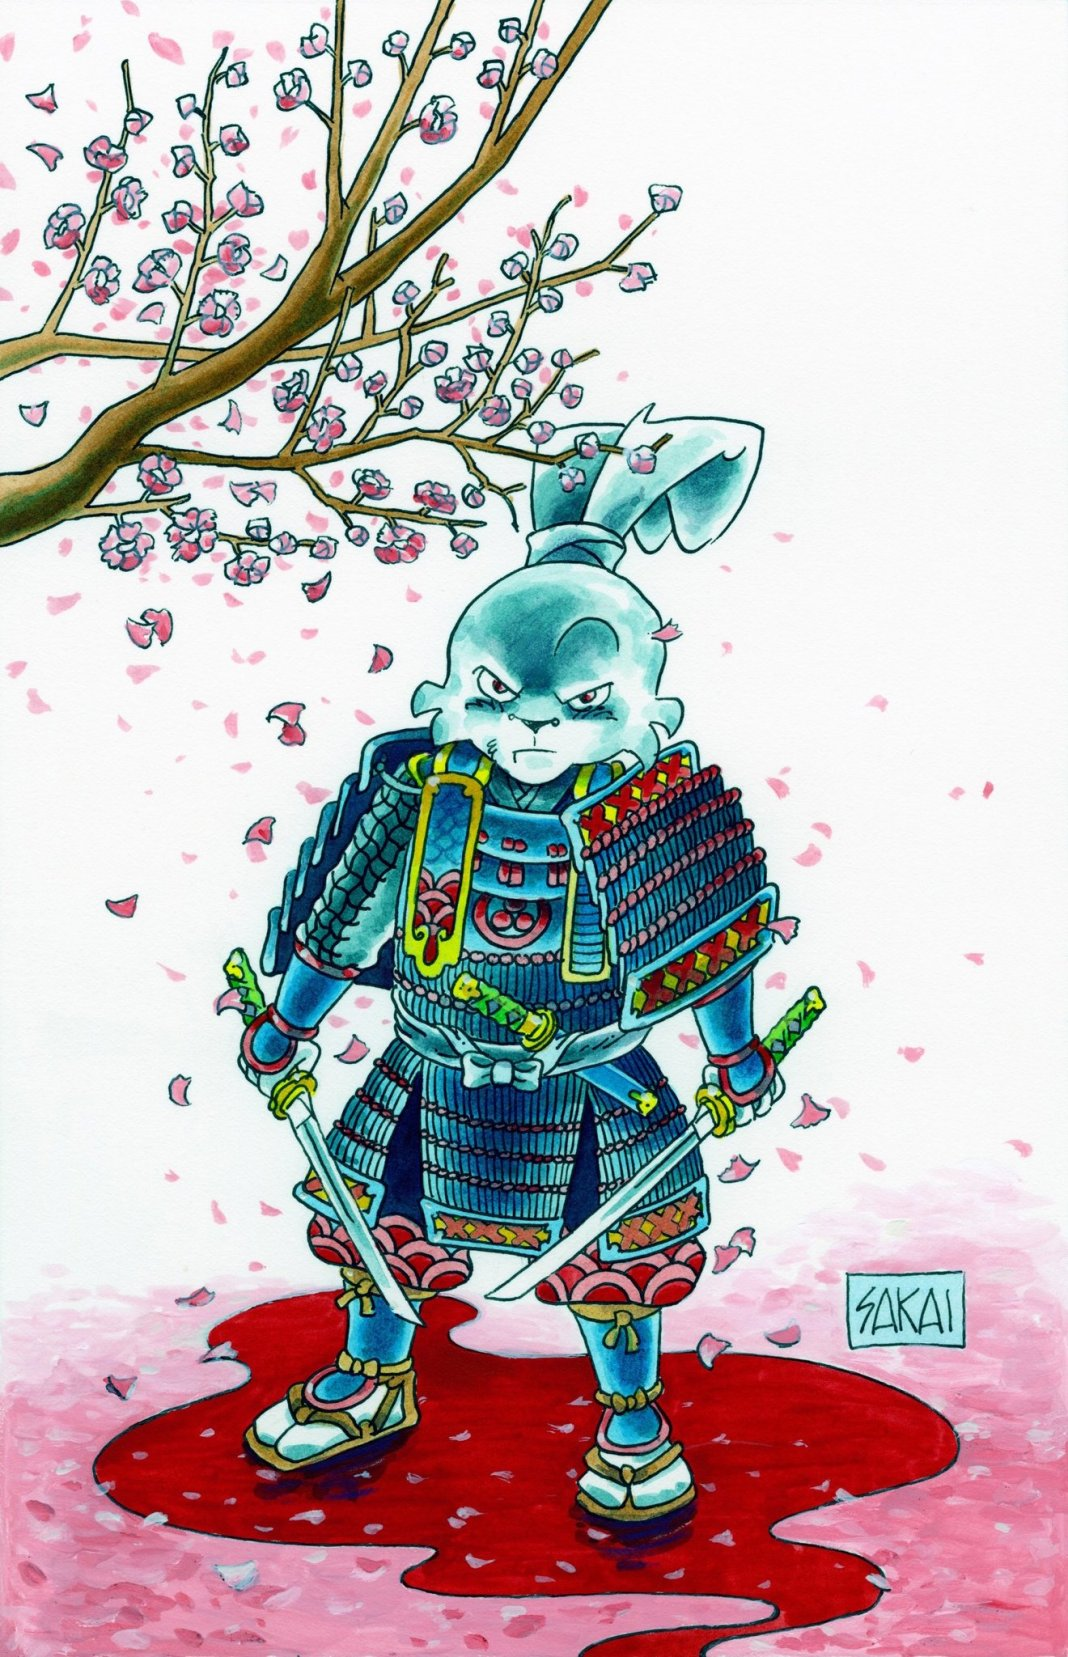 23idw-item-cover-superJumbo